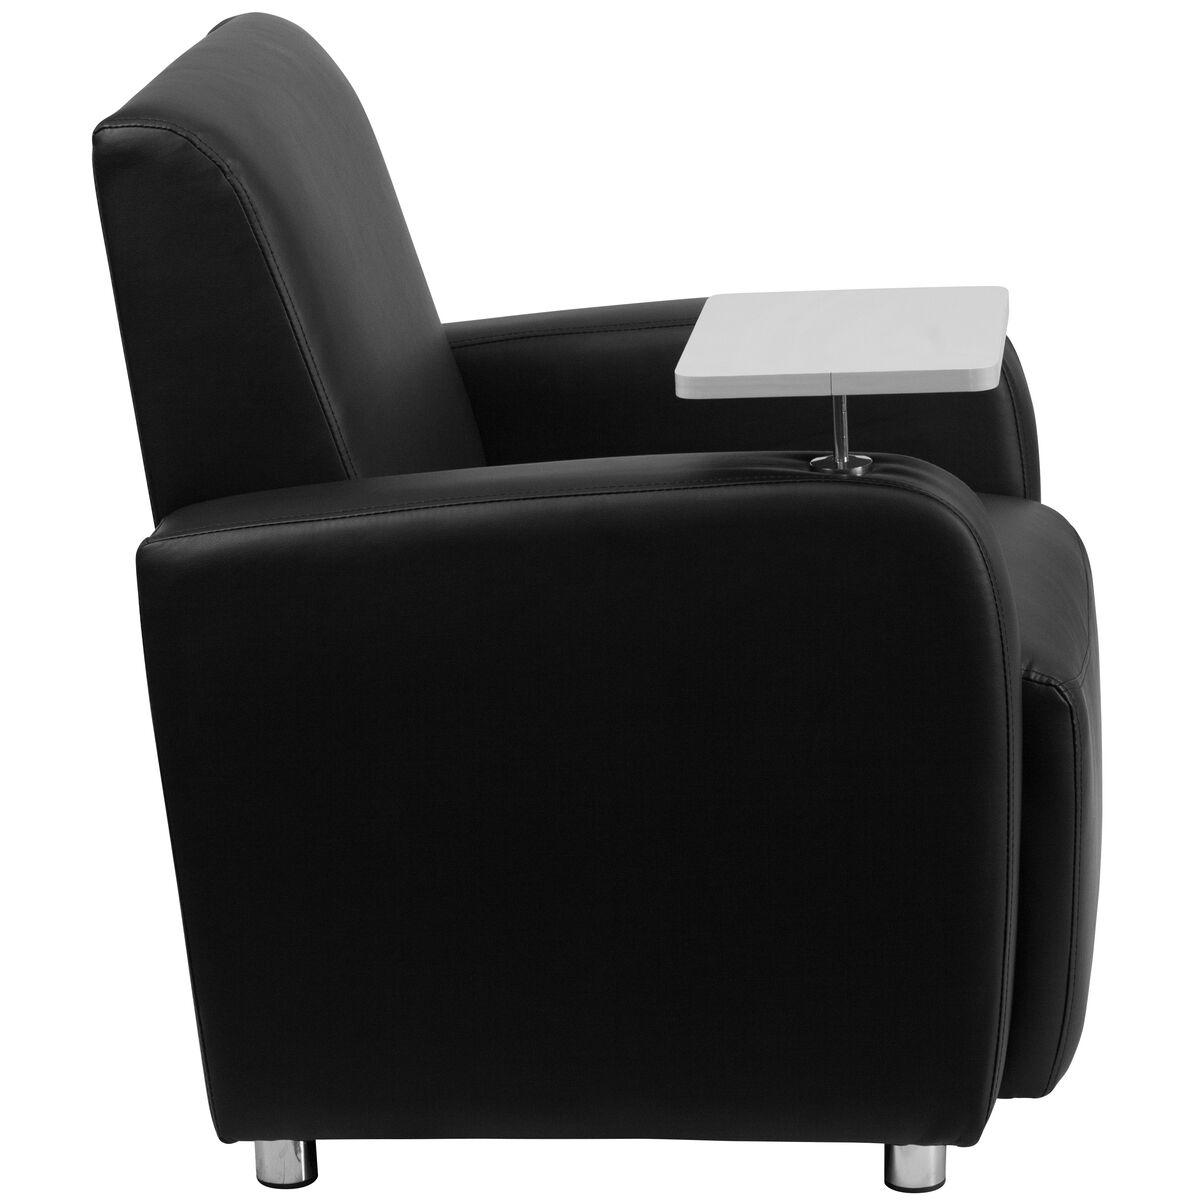 Black Leather Tablet Chair Bt 8217 Bk Gg Churchchairs4less Com